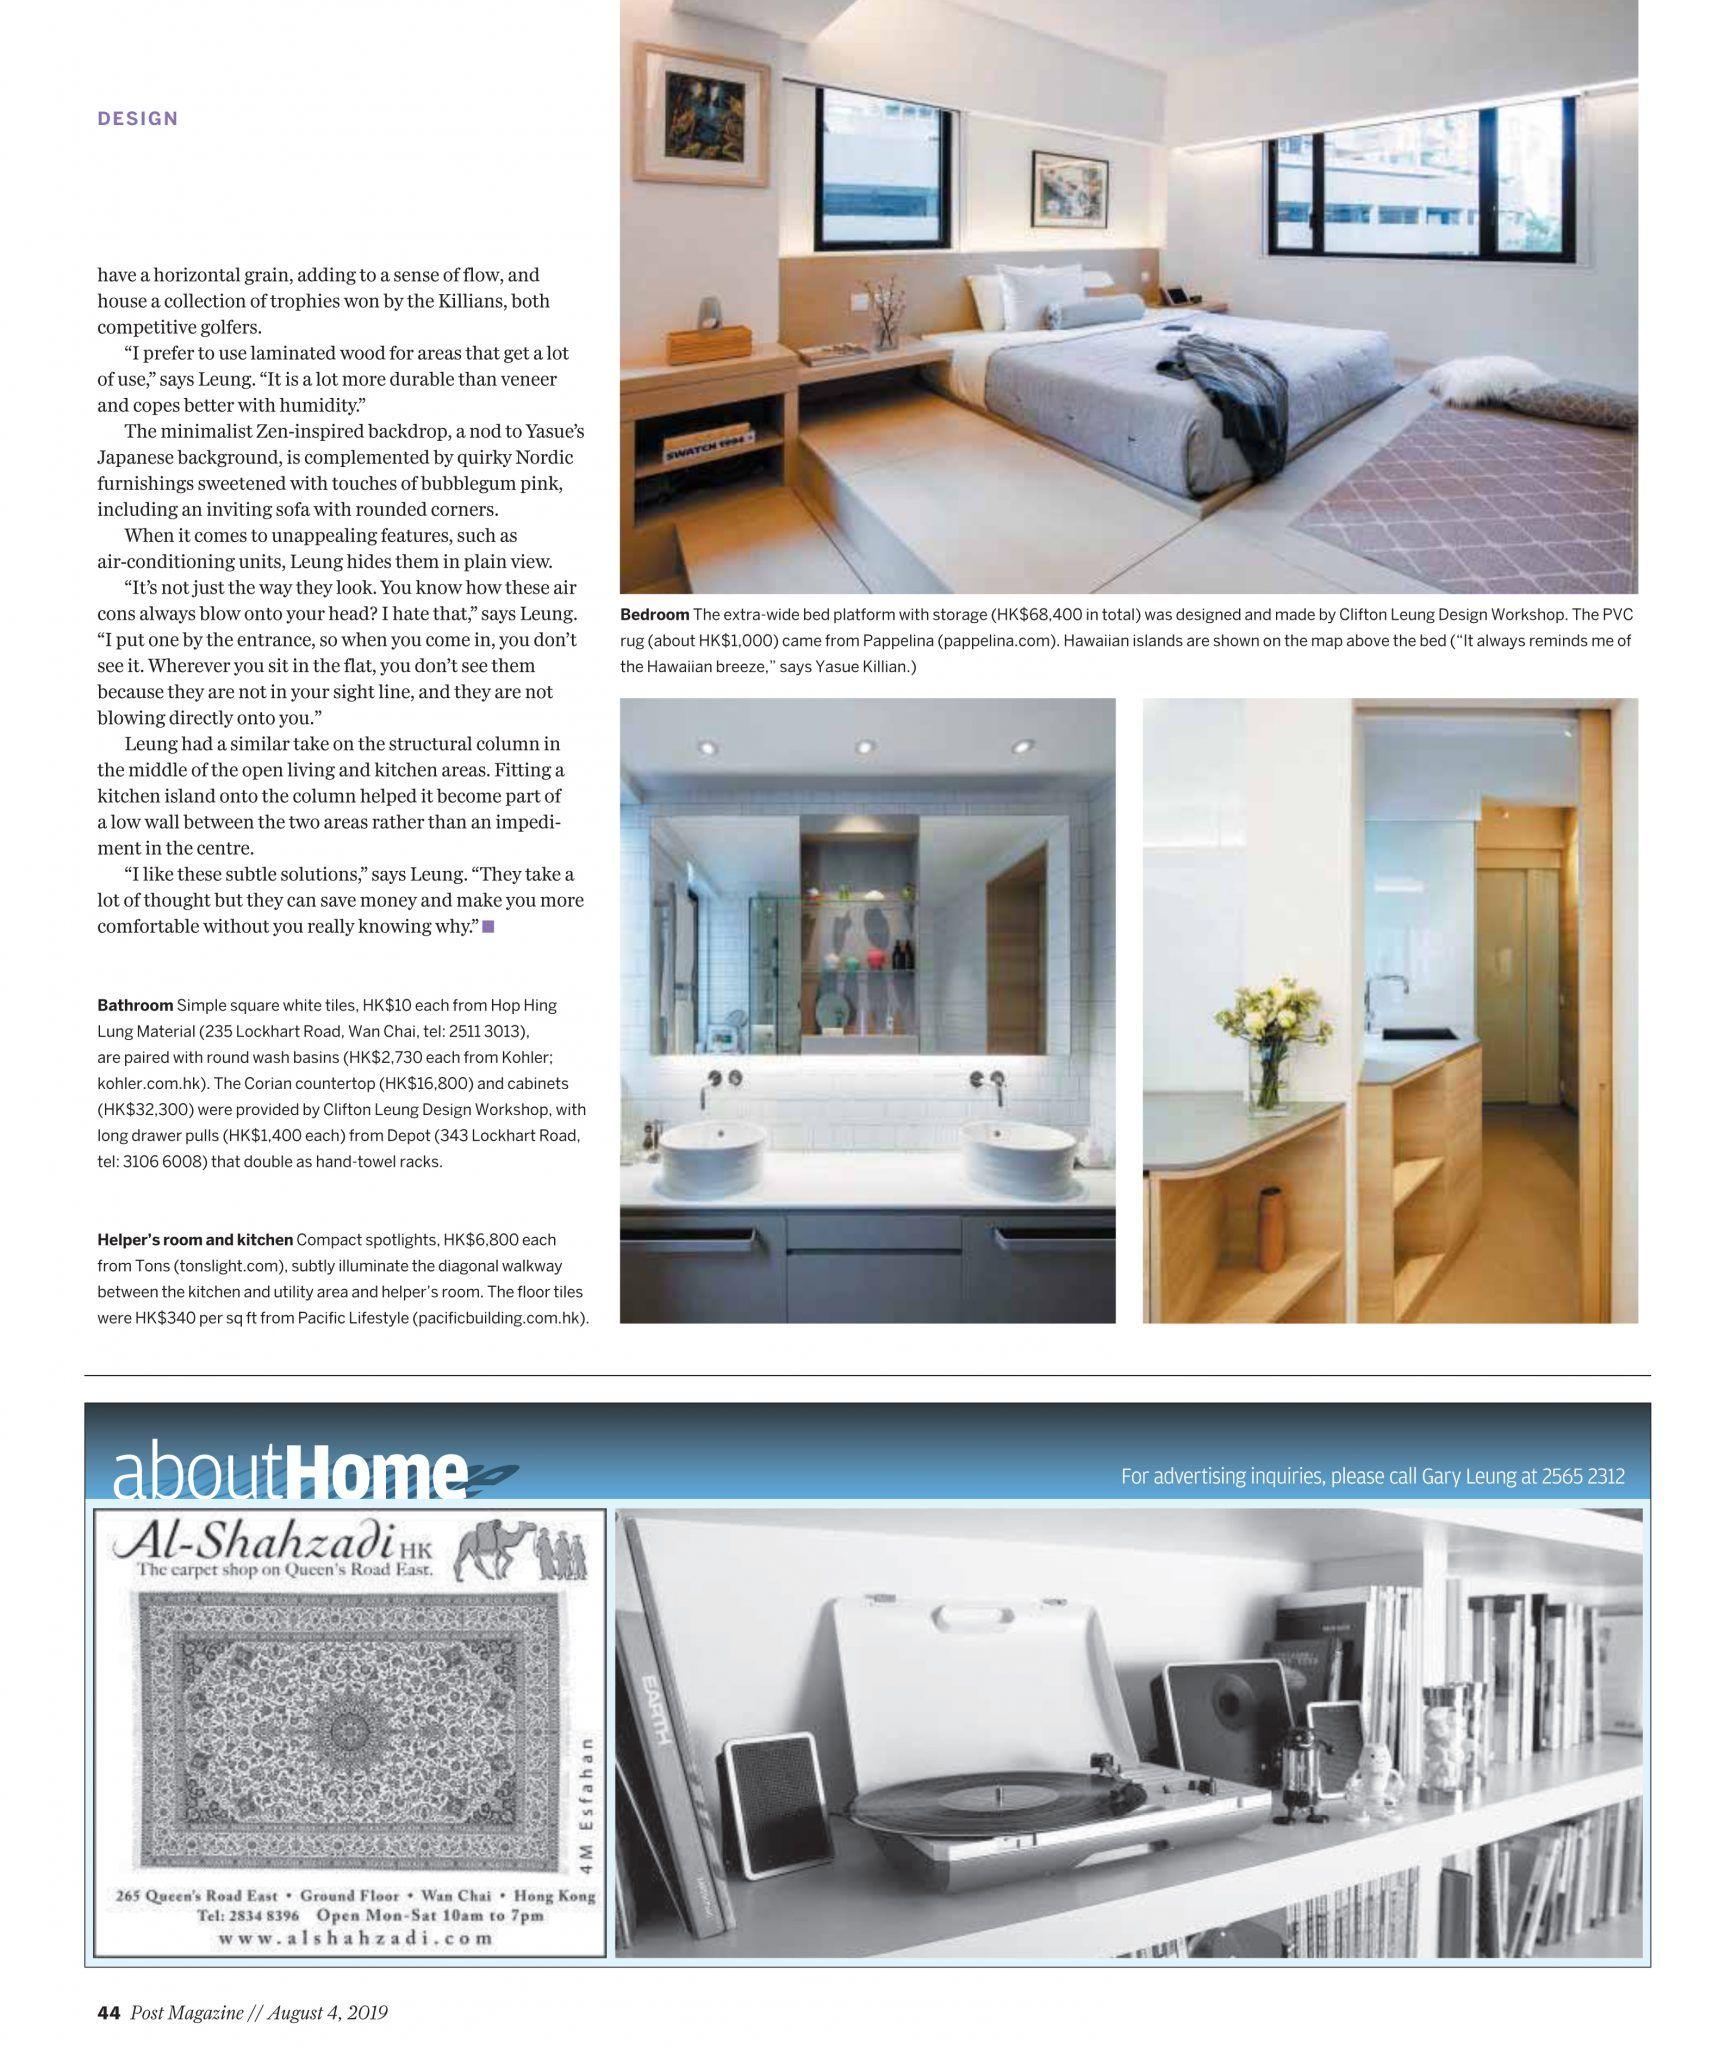 Dog Friendly Home Scmp Post Magazine One Bedroom Flat Home Bespoke Interiors